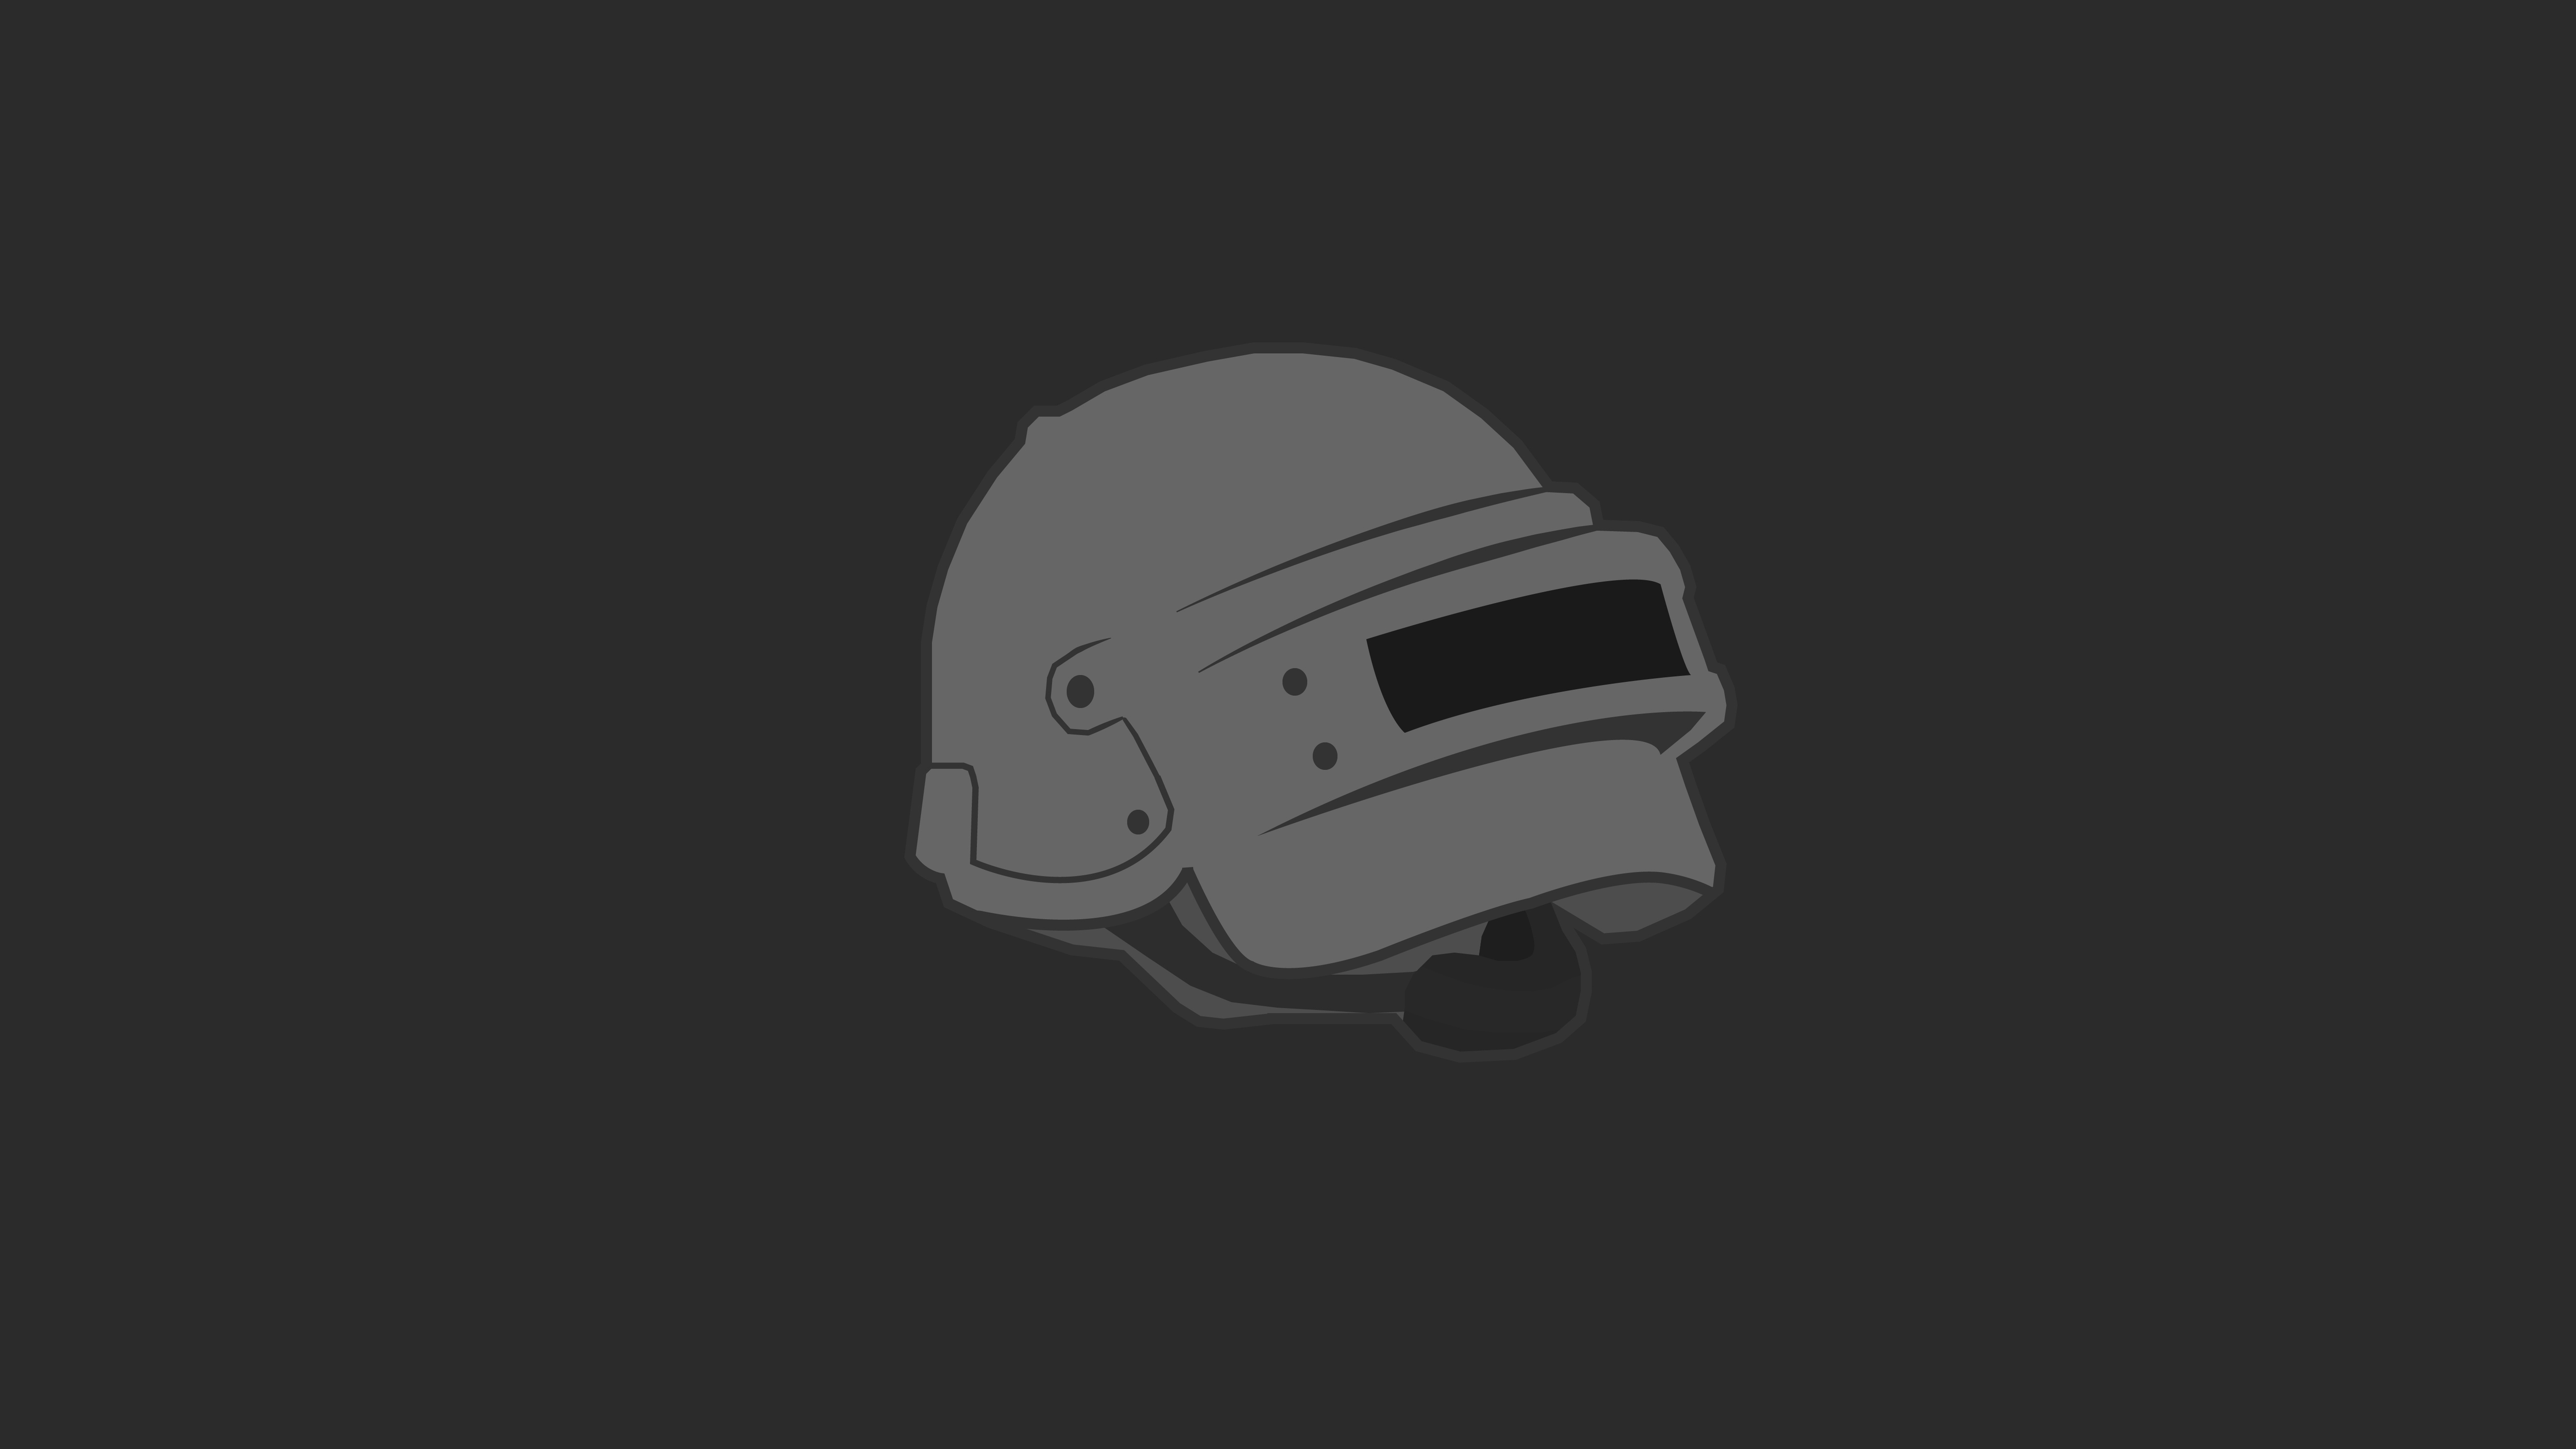 pubg-helmet-logo-4k-uc.jpg